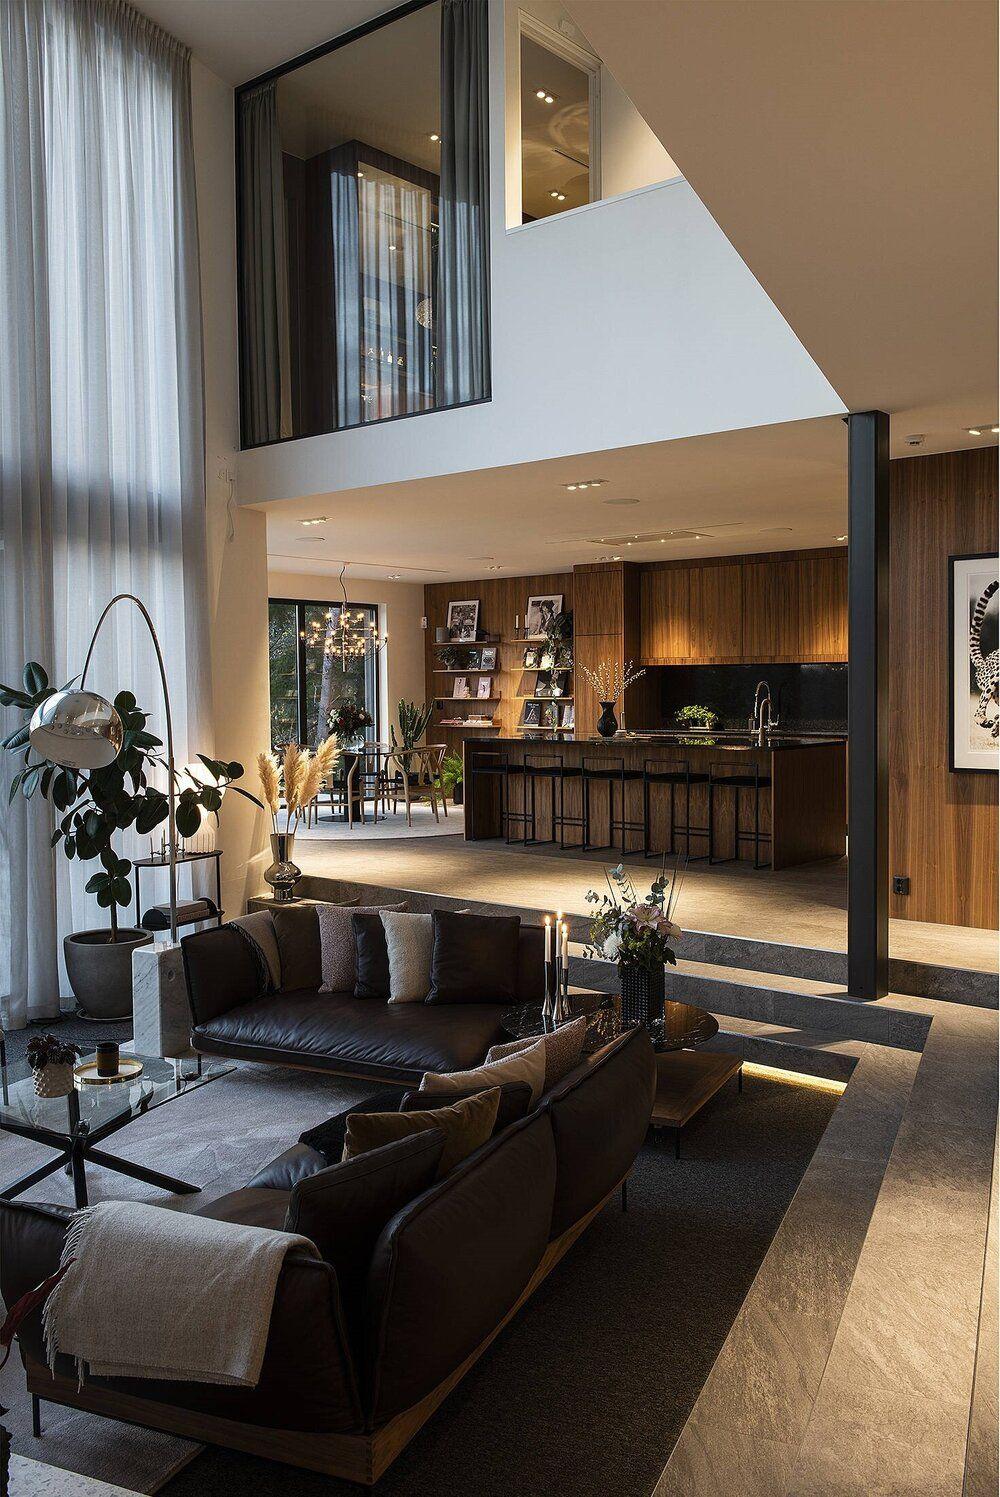 A Luxurious Open Plan Architectural Villa In Sweden The Nordroom Modern Home Interior Design Luxury Living Room Design Modern Houses Interior